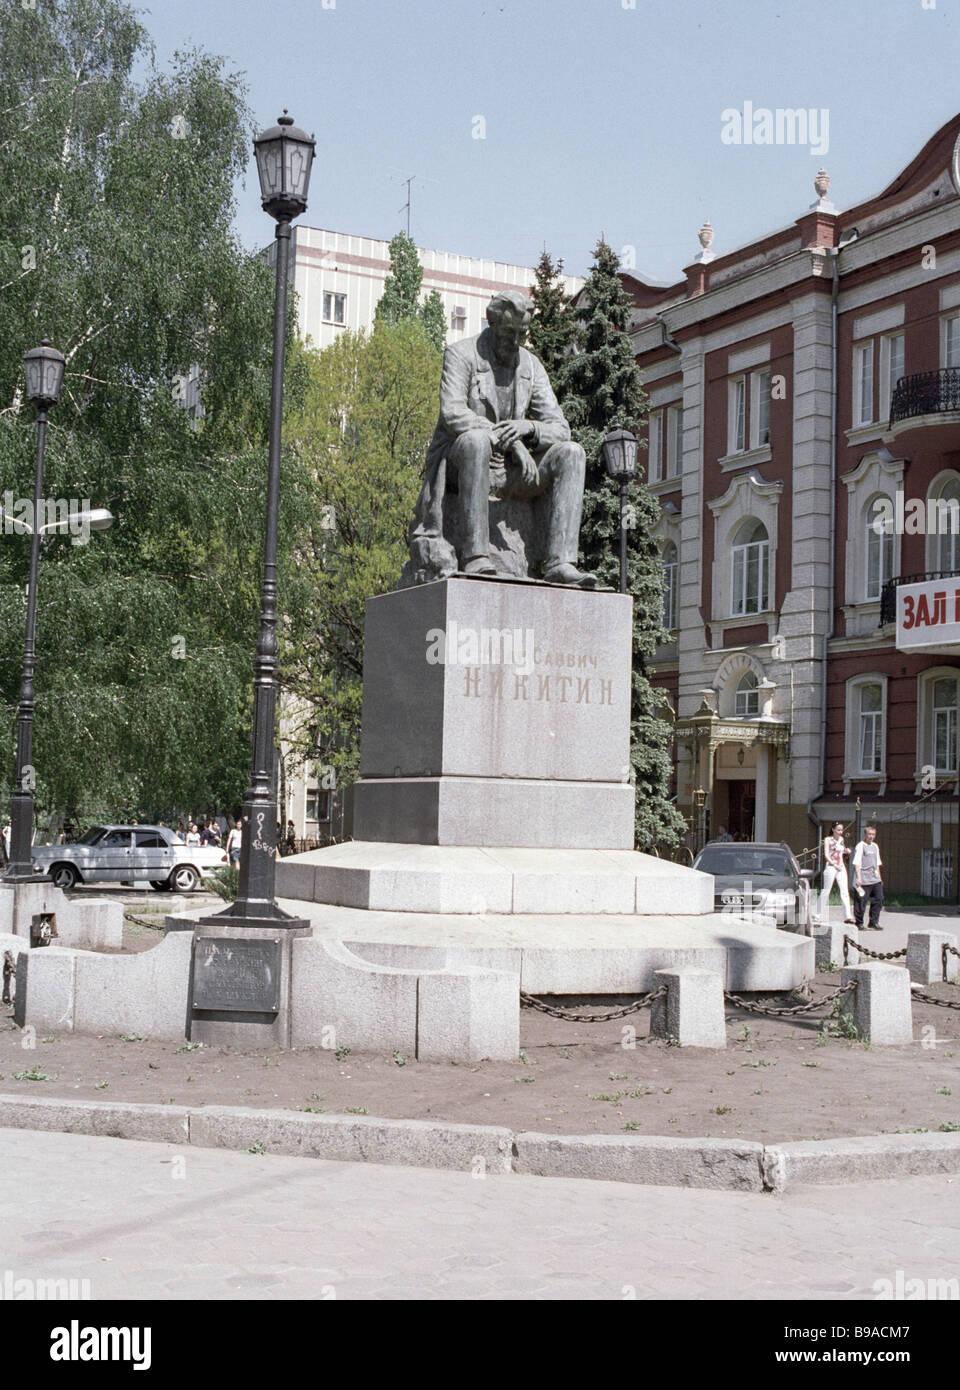 Monument to Russian poet Ivan Nikitin 1824 1861 - Stock Image